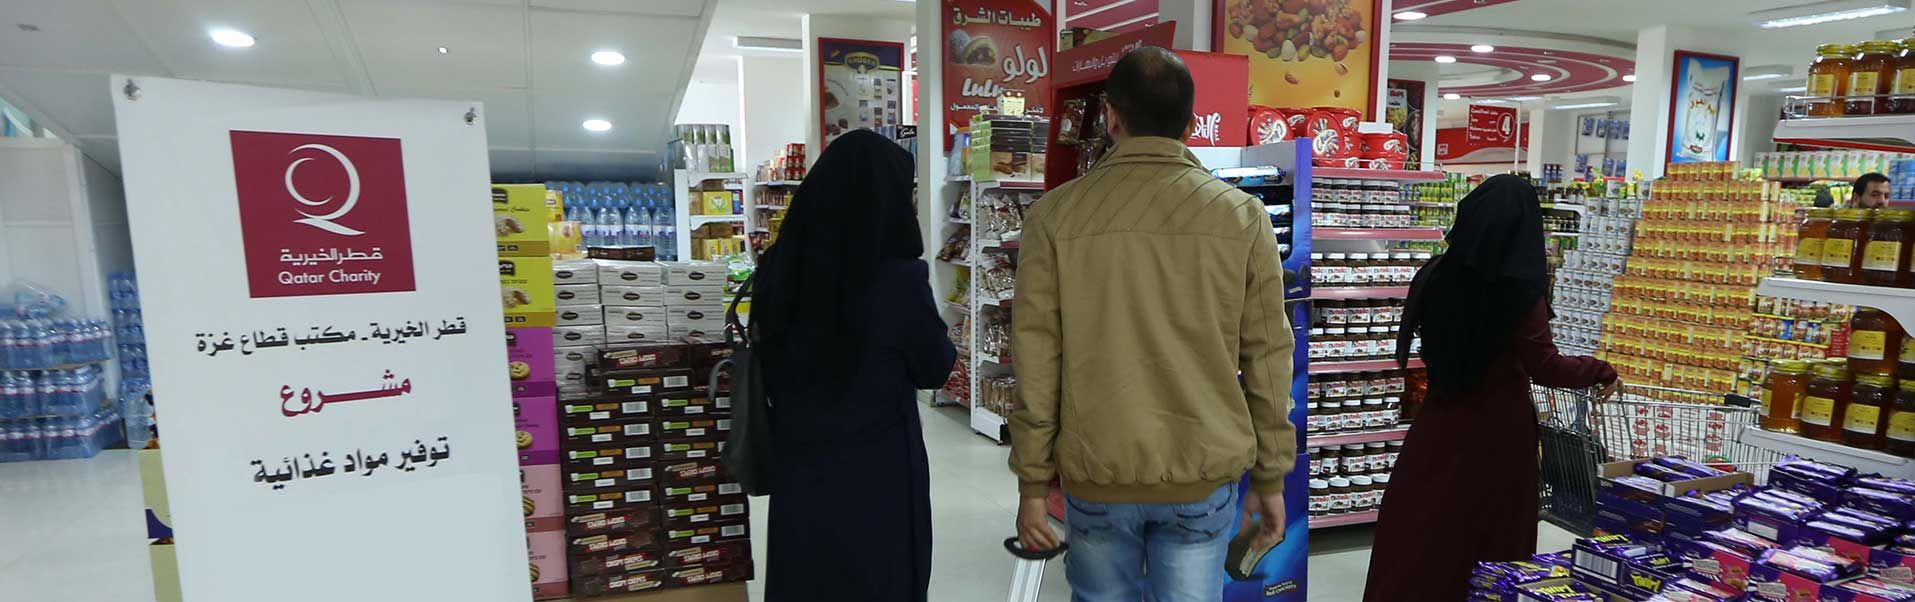 Qatar Charity Distributes Food Baskets To Poor Fishermen Of Gaza Food Basket Charity International Charities